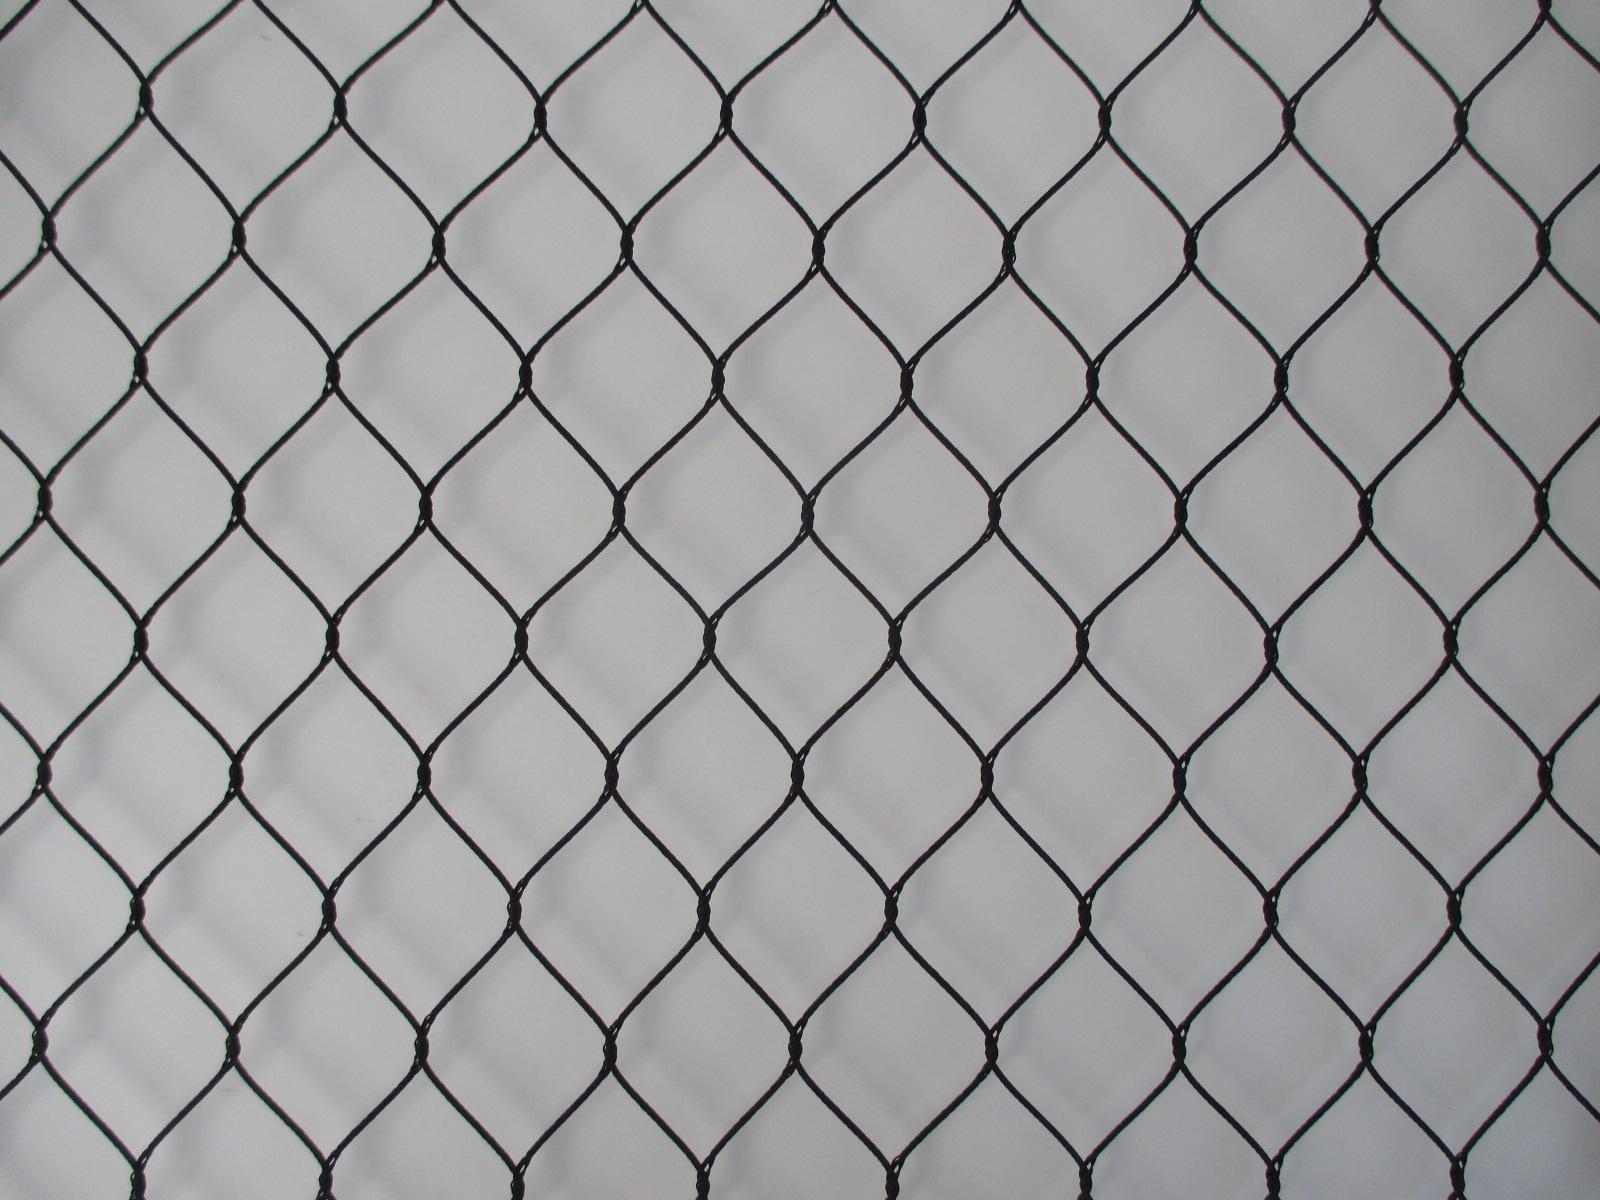 Hand Woven Steel Mesh - Black Oxide